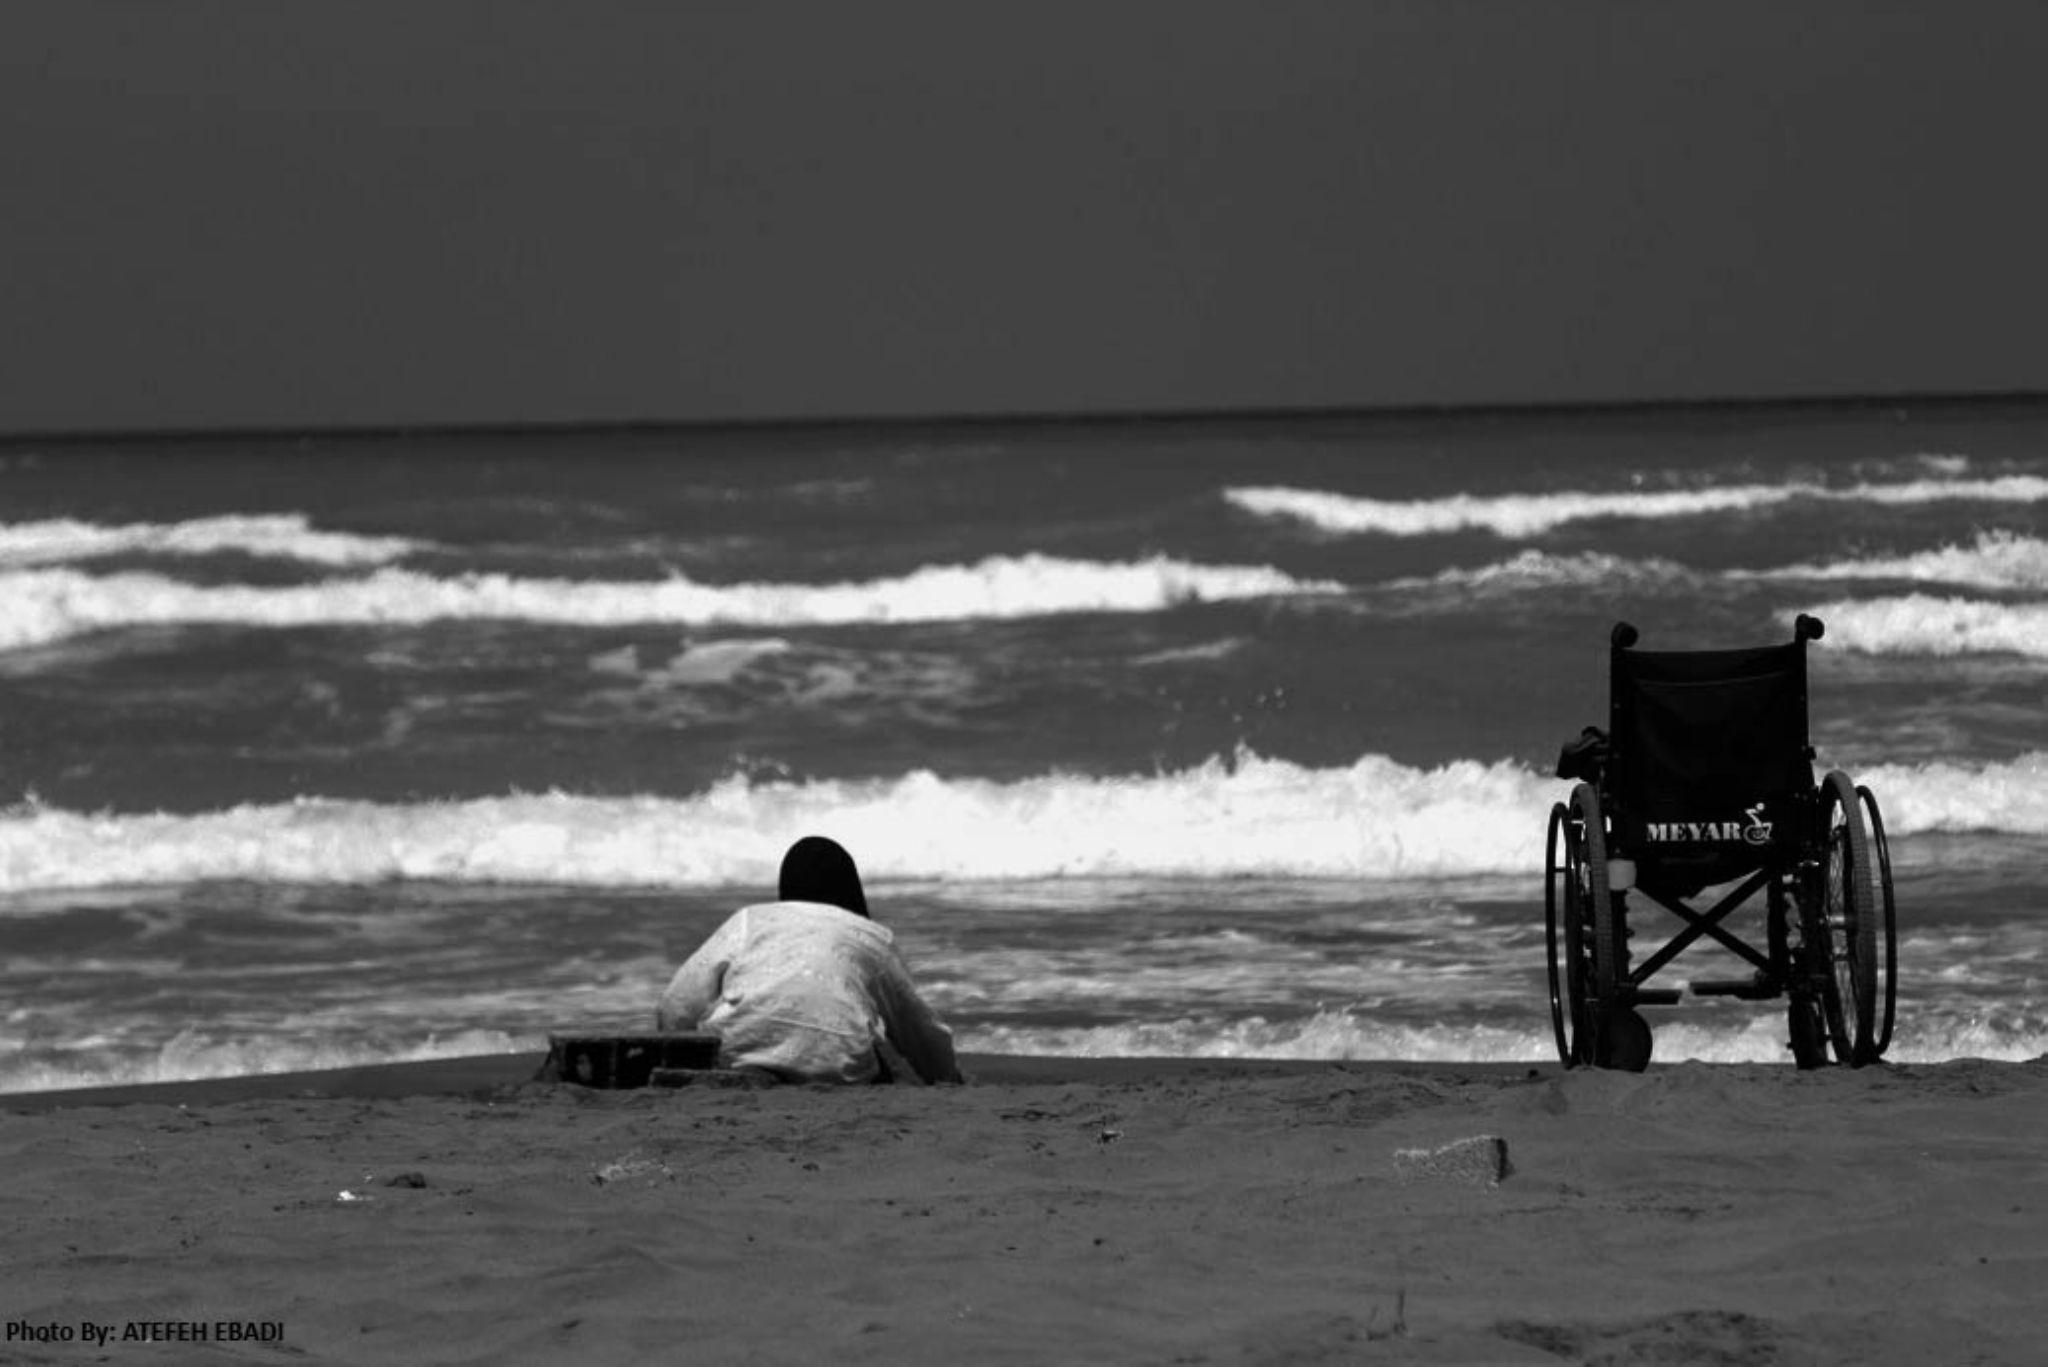 Untitled by Atefeh Ebadi